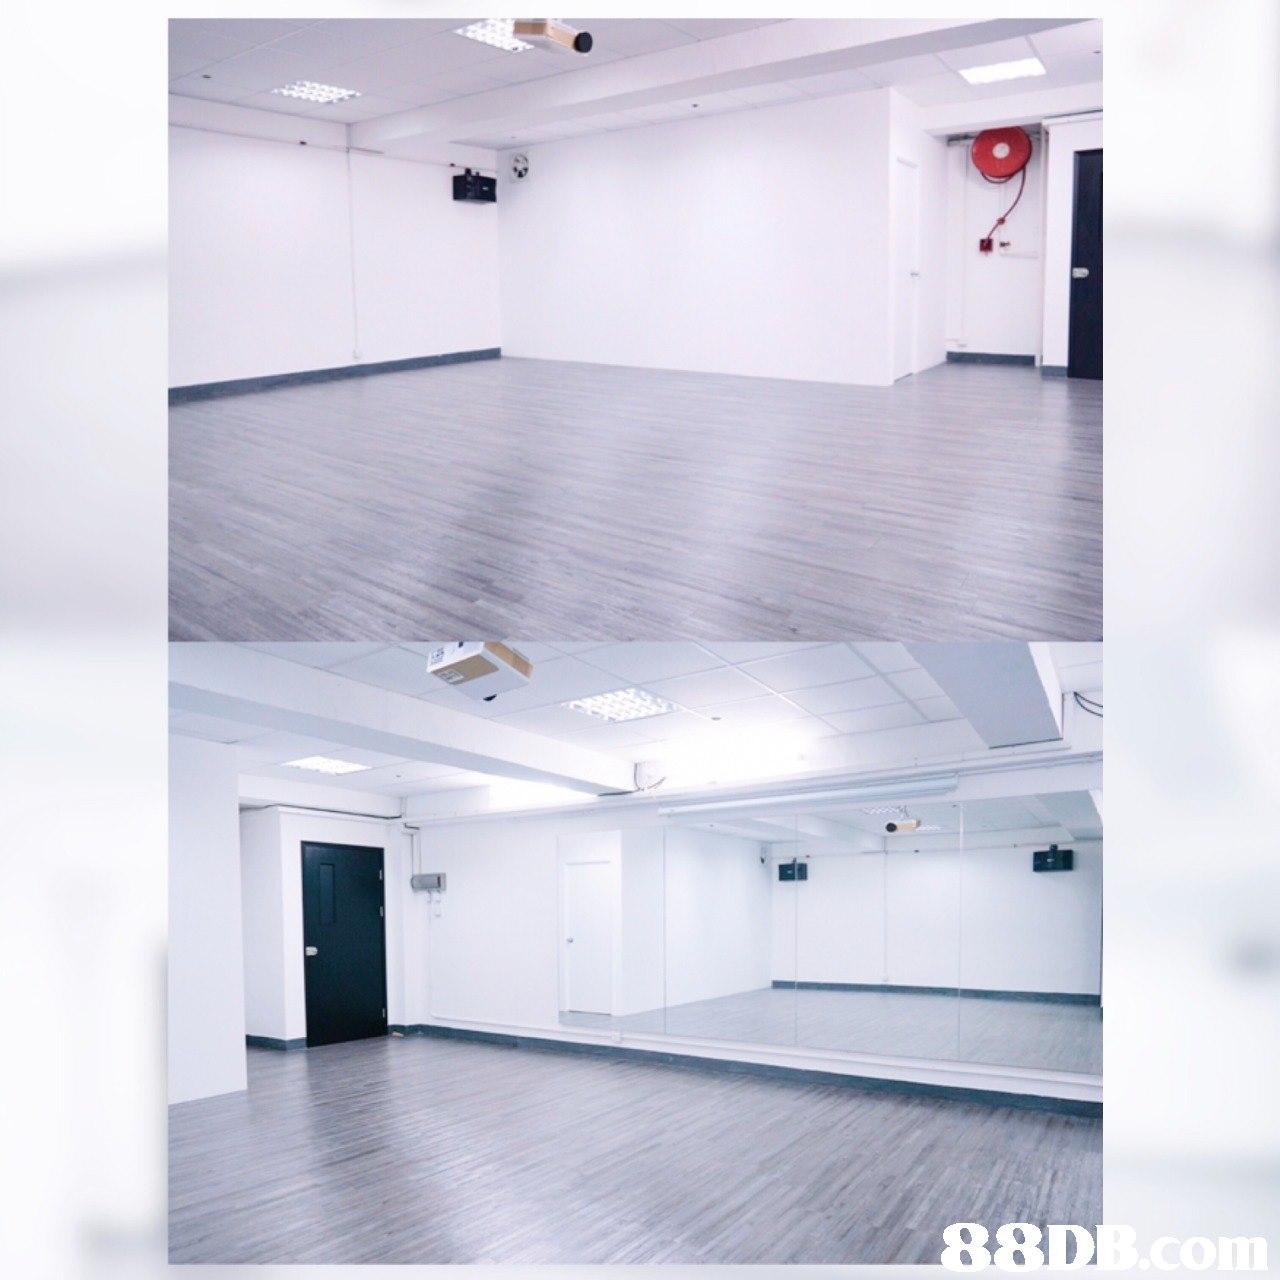 88D com  Ceiling,Floor,Wall,Flooring,Room